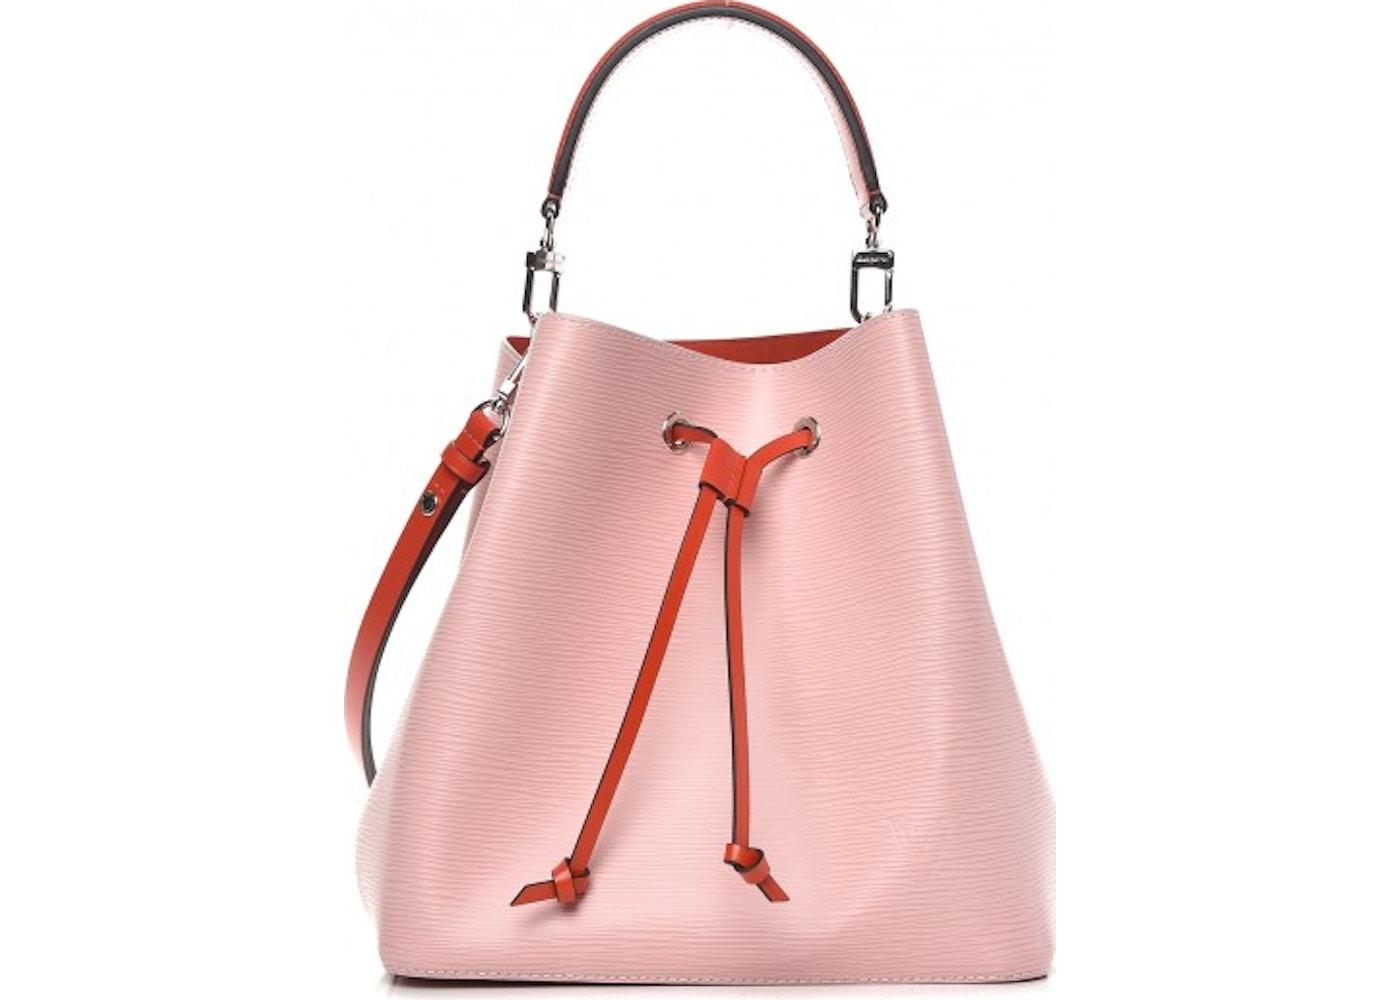 8bf48c908d7c Louis Vuitton Bucket Bag NeoNoe Epi Rose Ballerine Orange. Epi Rose  Ballerine Orange